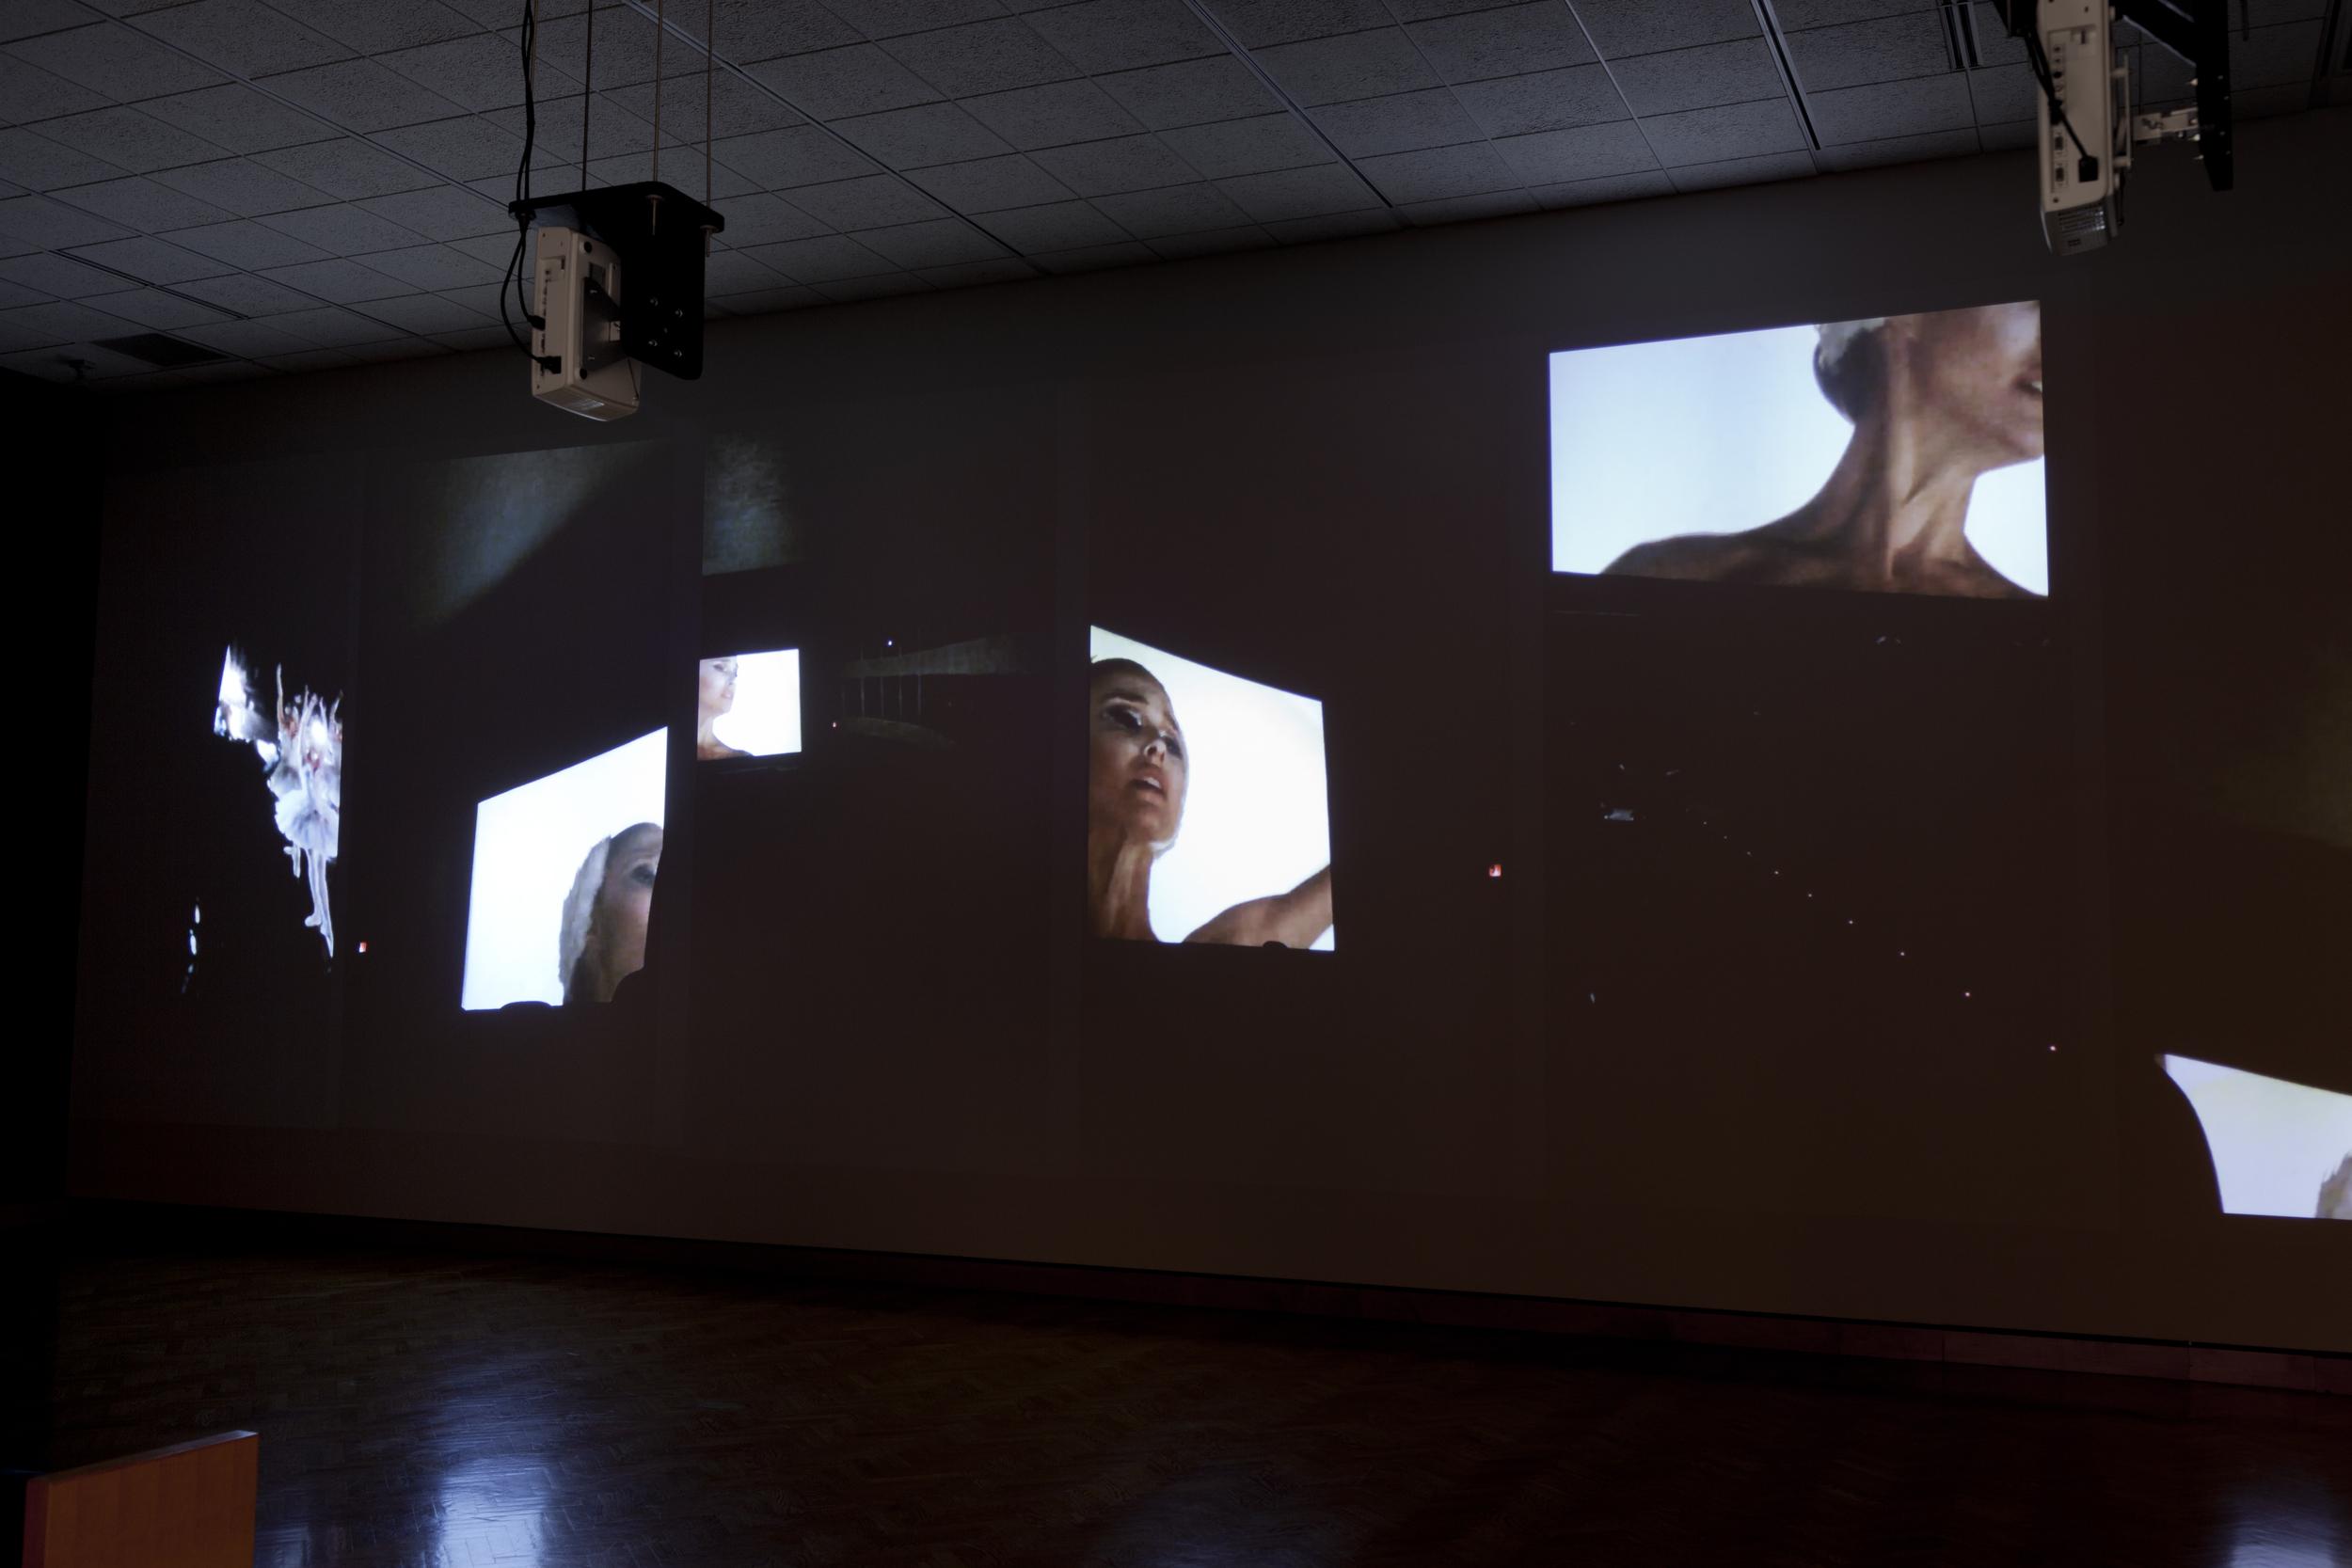 Movie (Black Swan) , six channel video installation, 8:23, Minneapolis Institute of Arts, 2011, Walker Art Center, 2015